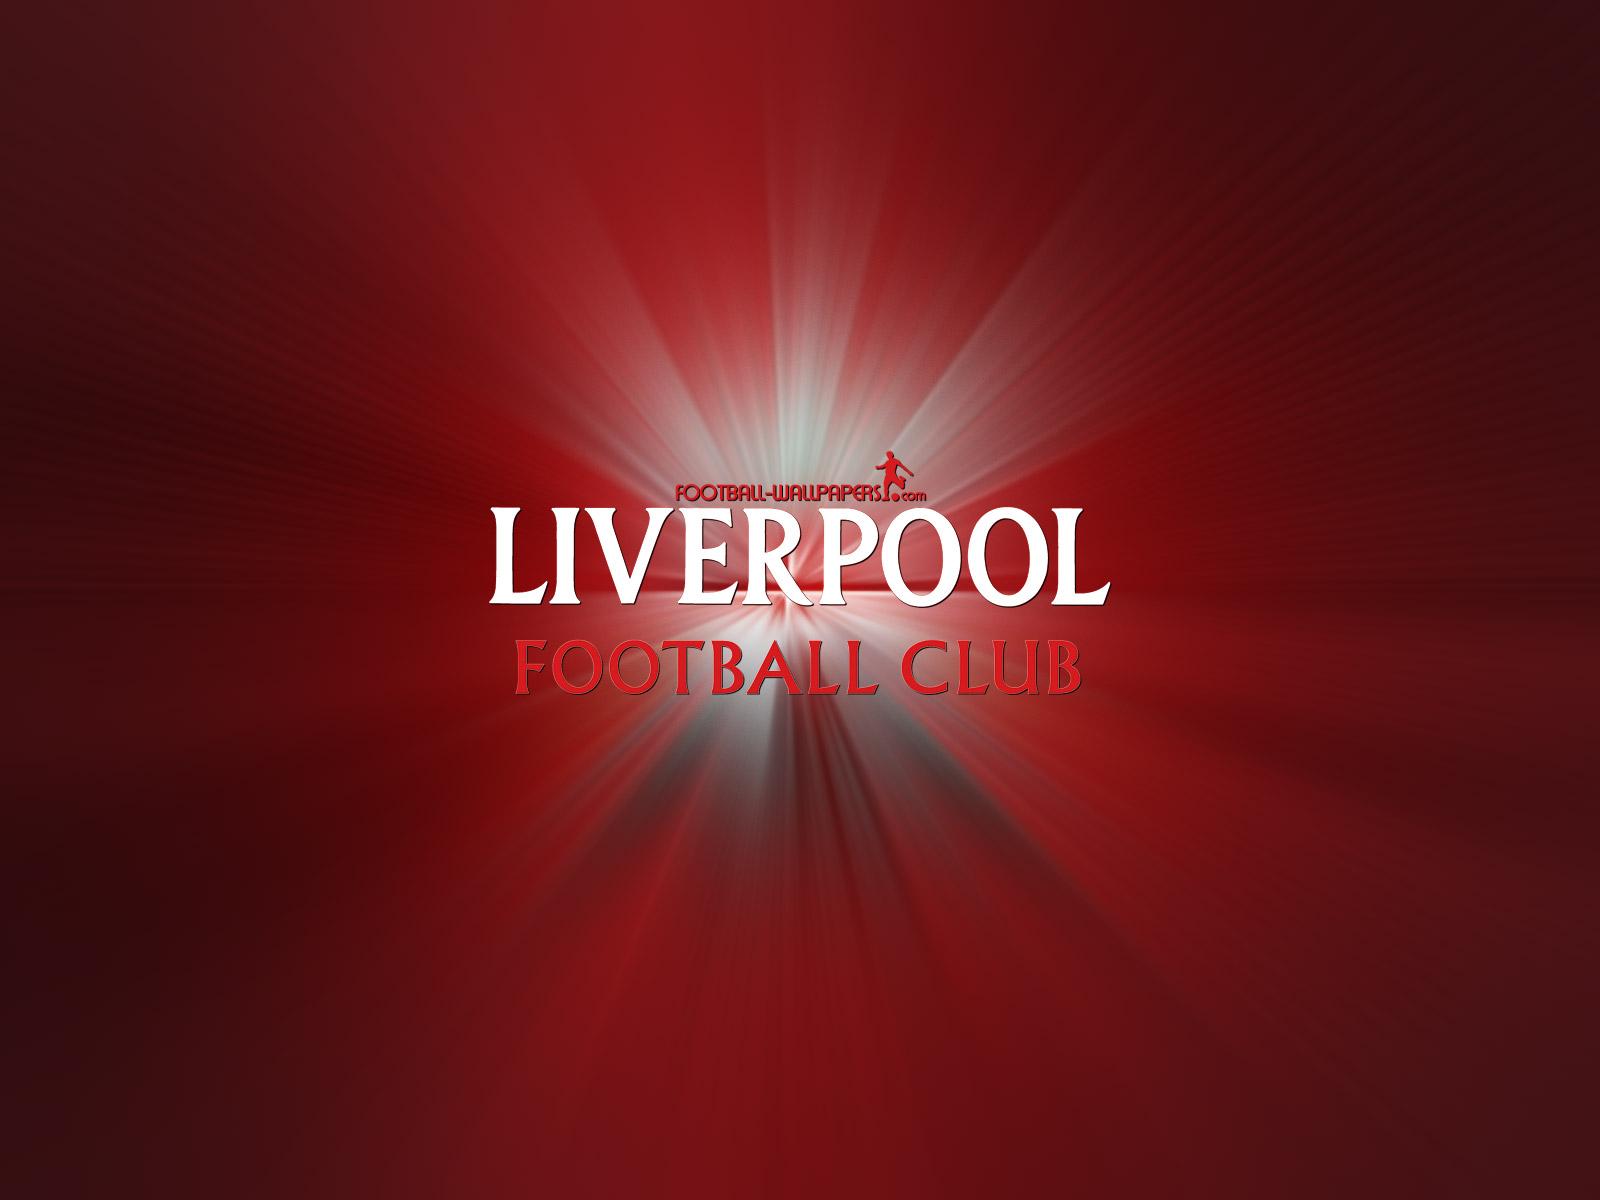 http://3.bp.blogspot.com/-j9xgH8M9vmQ/UQrYDhufWiI/AAAAAAAAP3M/Ymzn2TdvGrg/s1600/Liverpool+2013+Wallpapers+HD+3.jpg